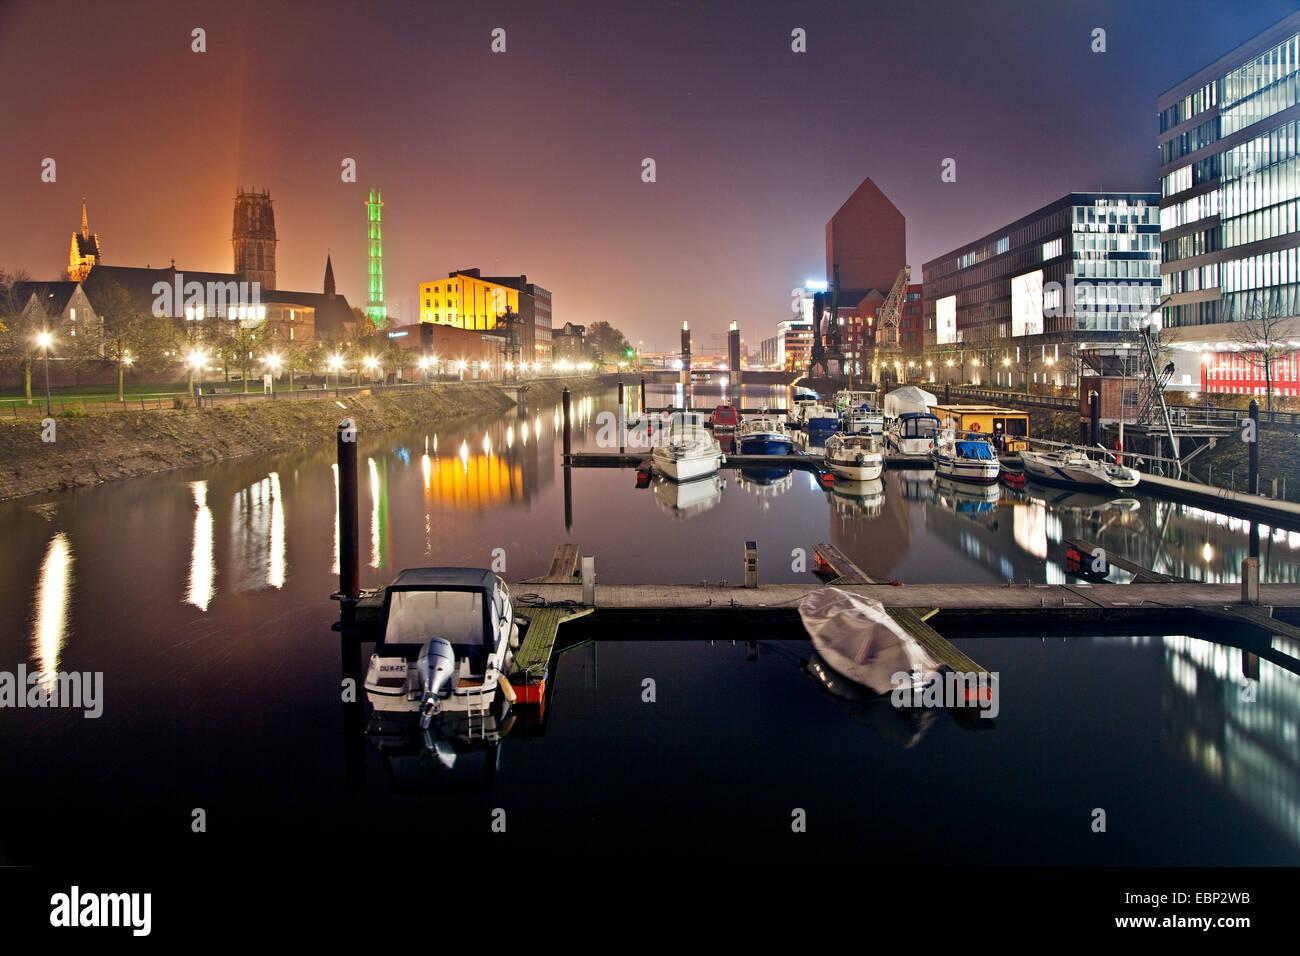 Duisburg marina at night, Germany, North Rhine-Westphalia, Ruhr Area, Duisburg - Stock Image